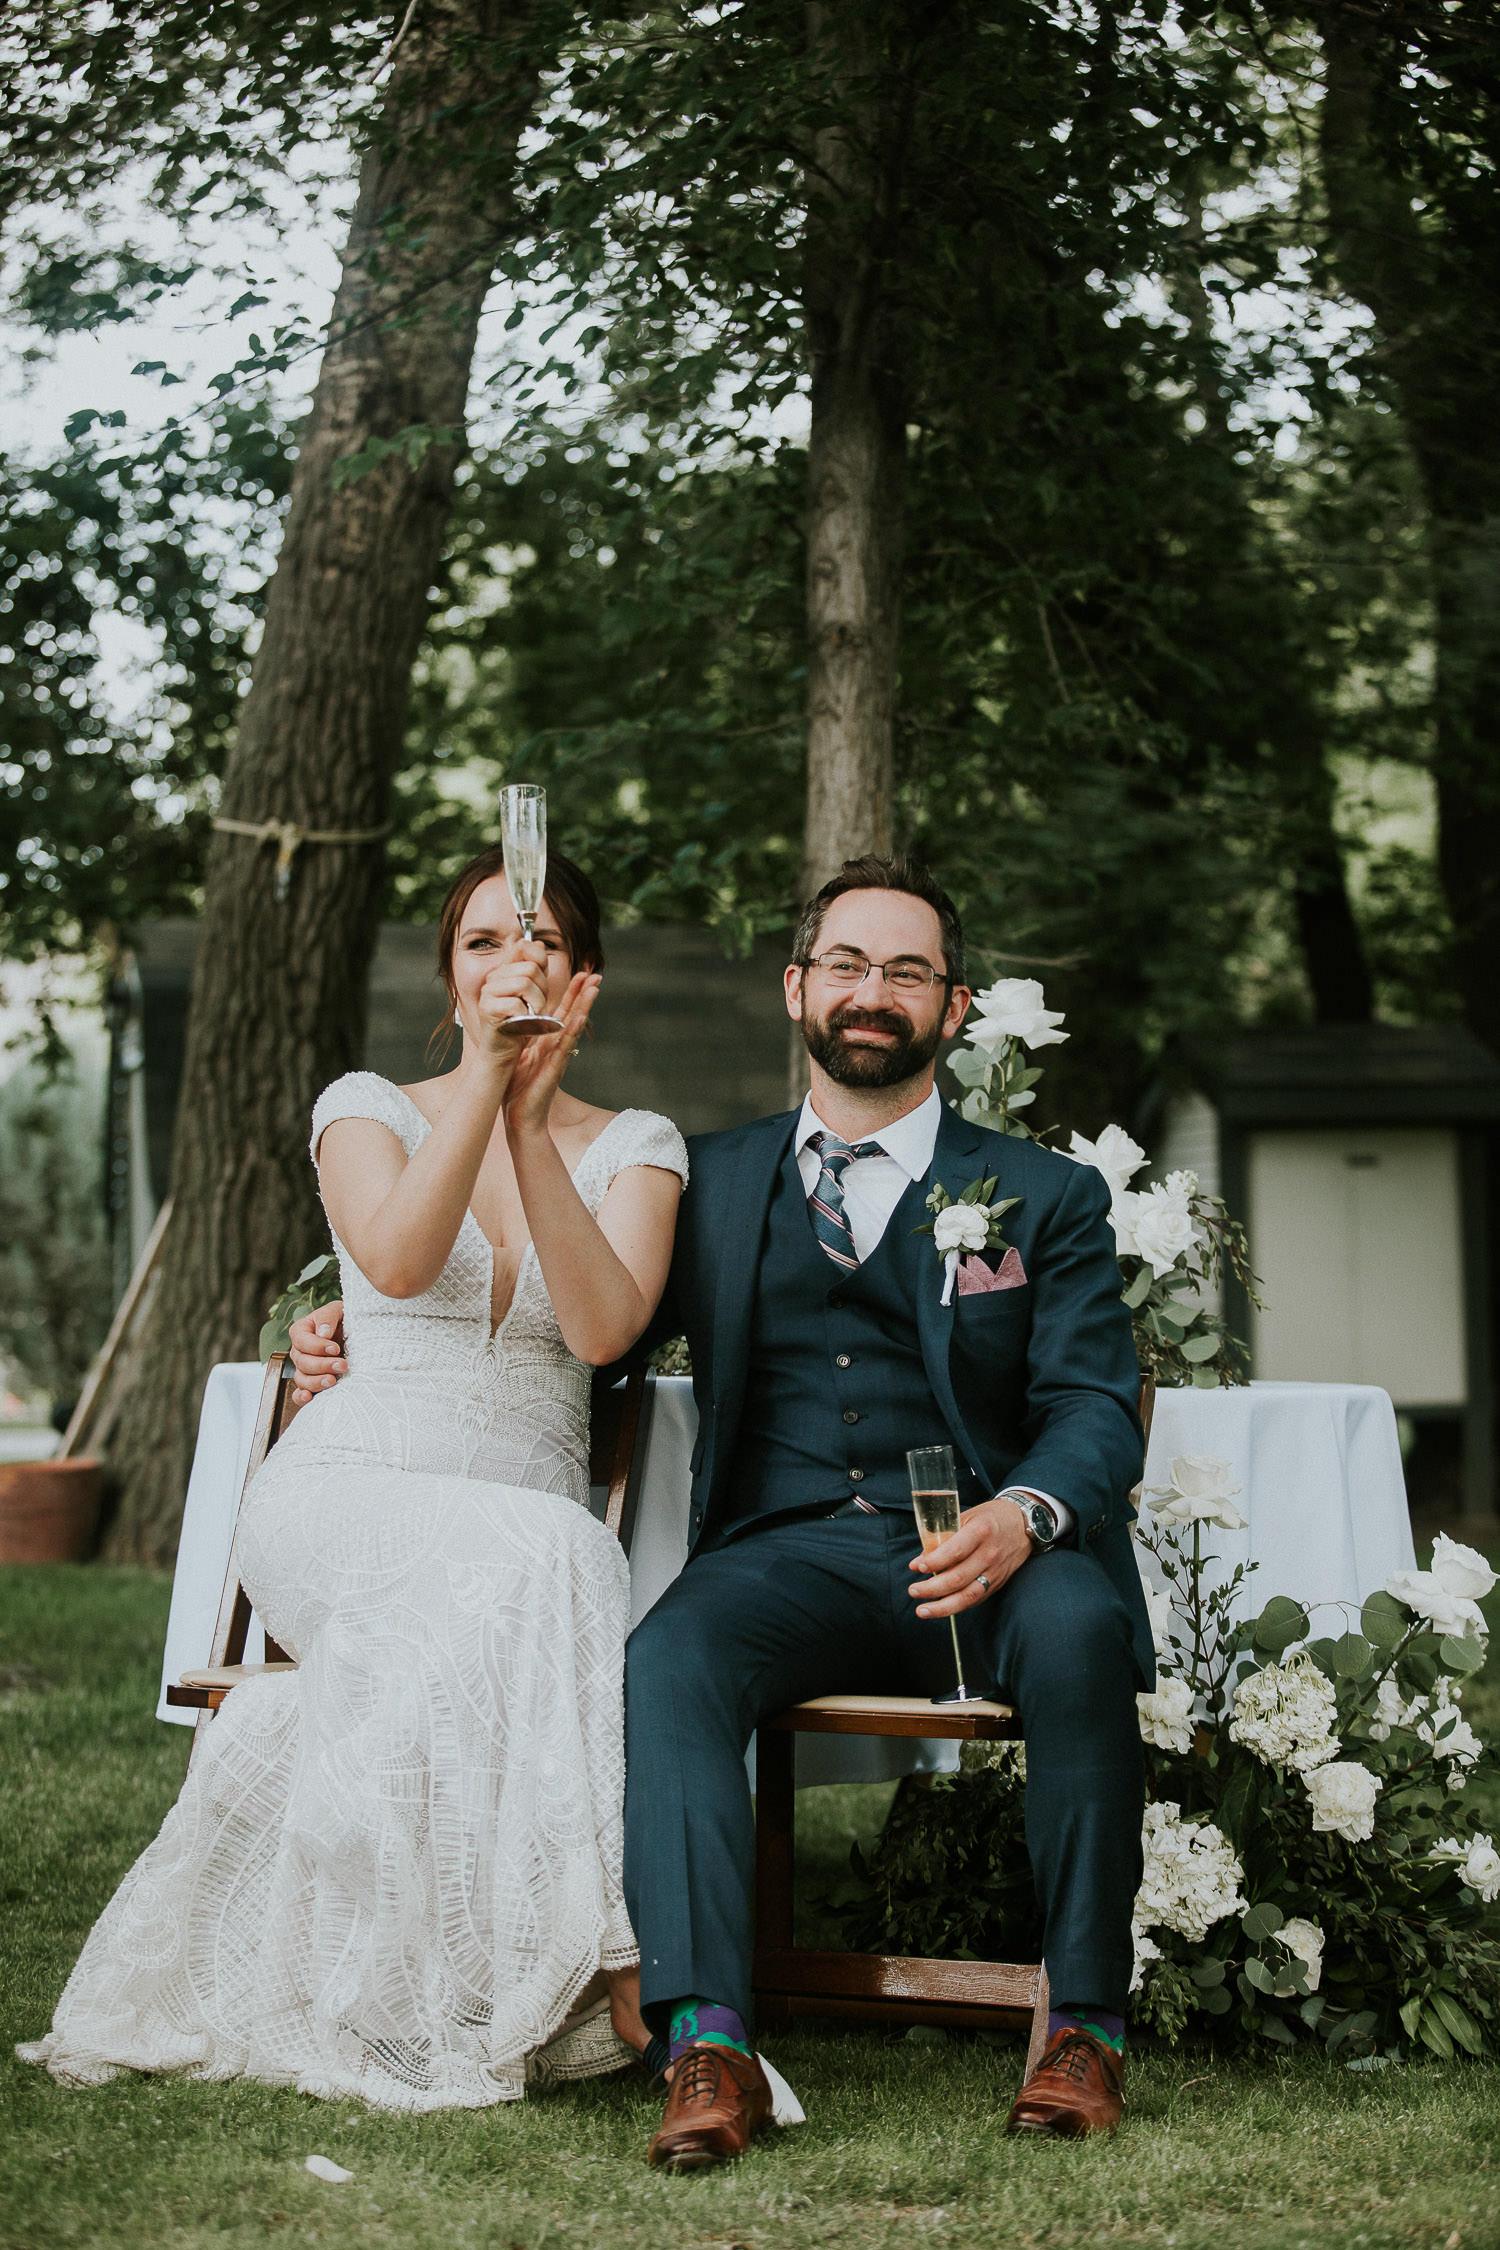 summer-backyard-wedding-in-alberta-sarah-pukin-0148